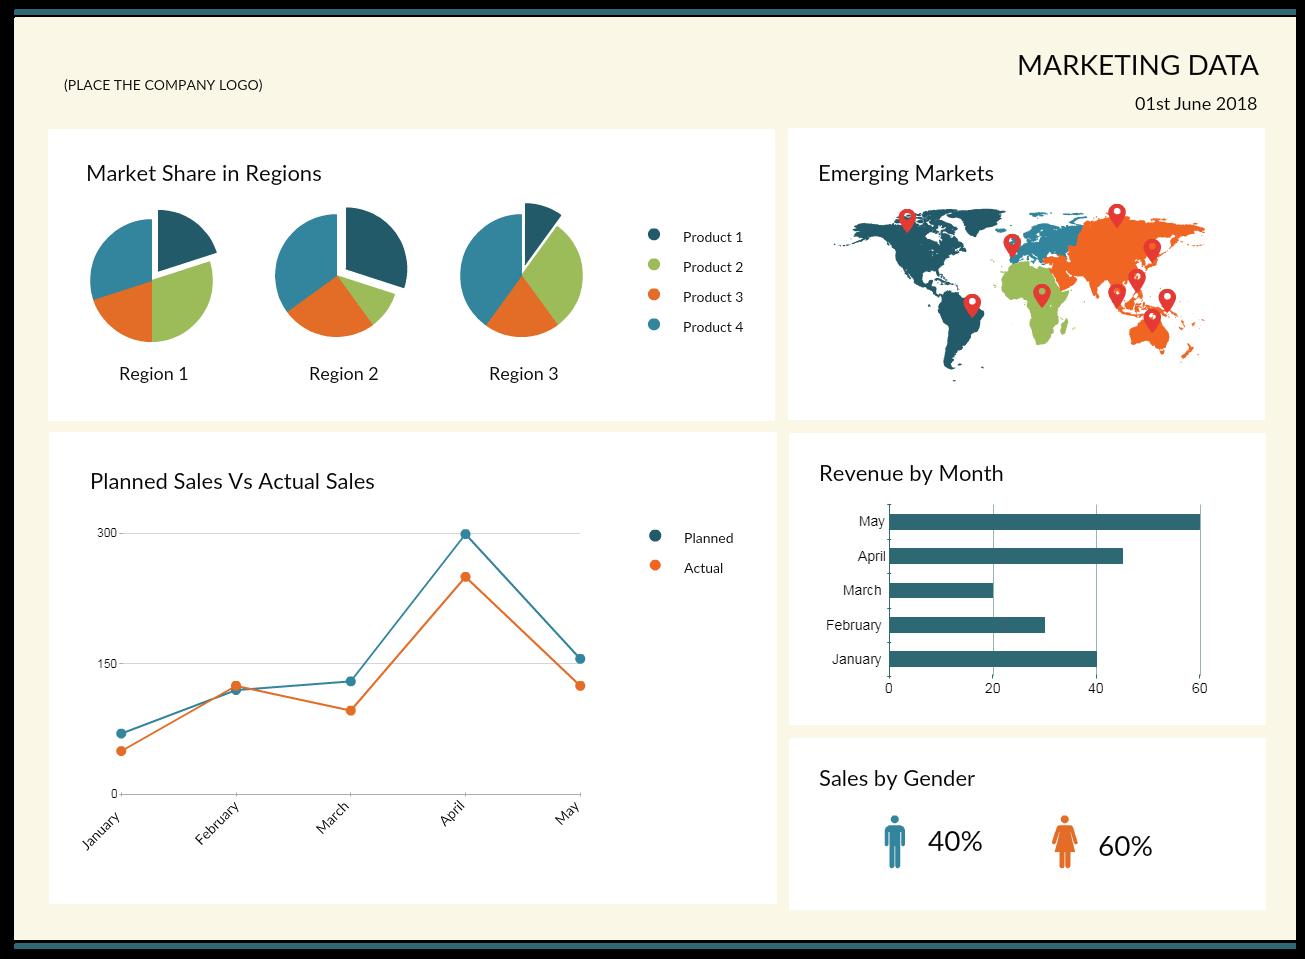 Marketing Data Dashboard Template - Marketing Strategy Tools